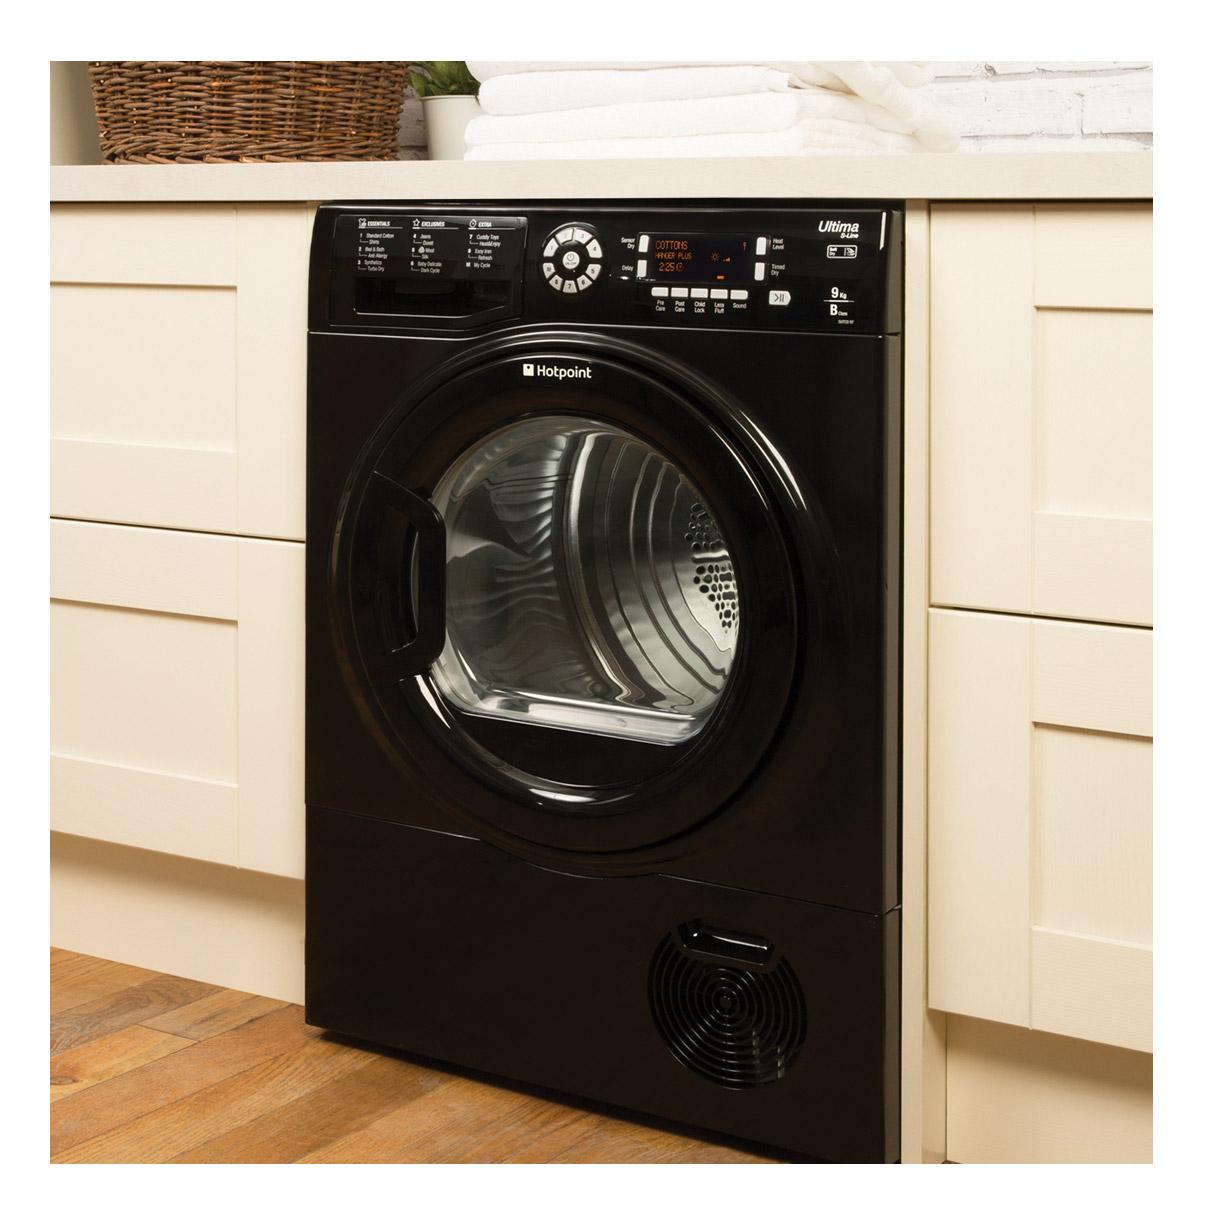 Lg Tumble Dryer Black ~ Hotpoint sutcd b km kg ultima condenser tumble dryer in